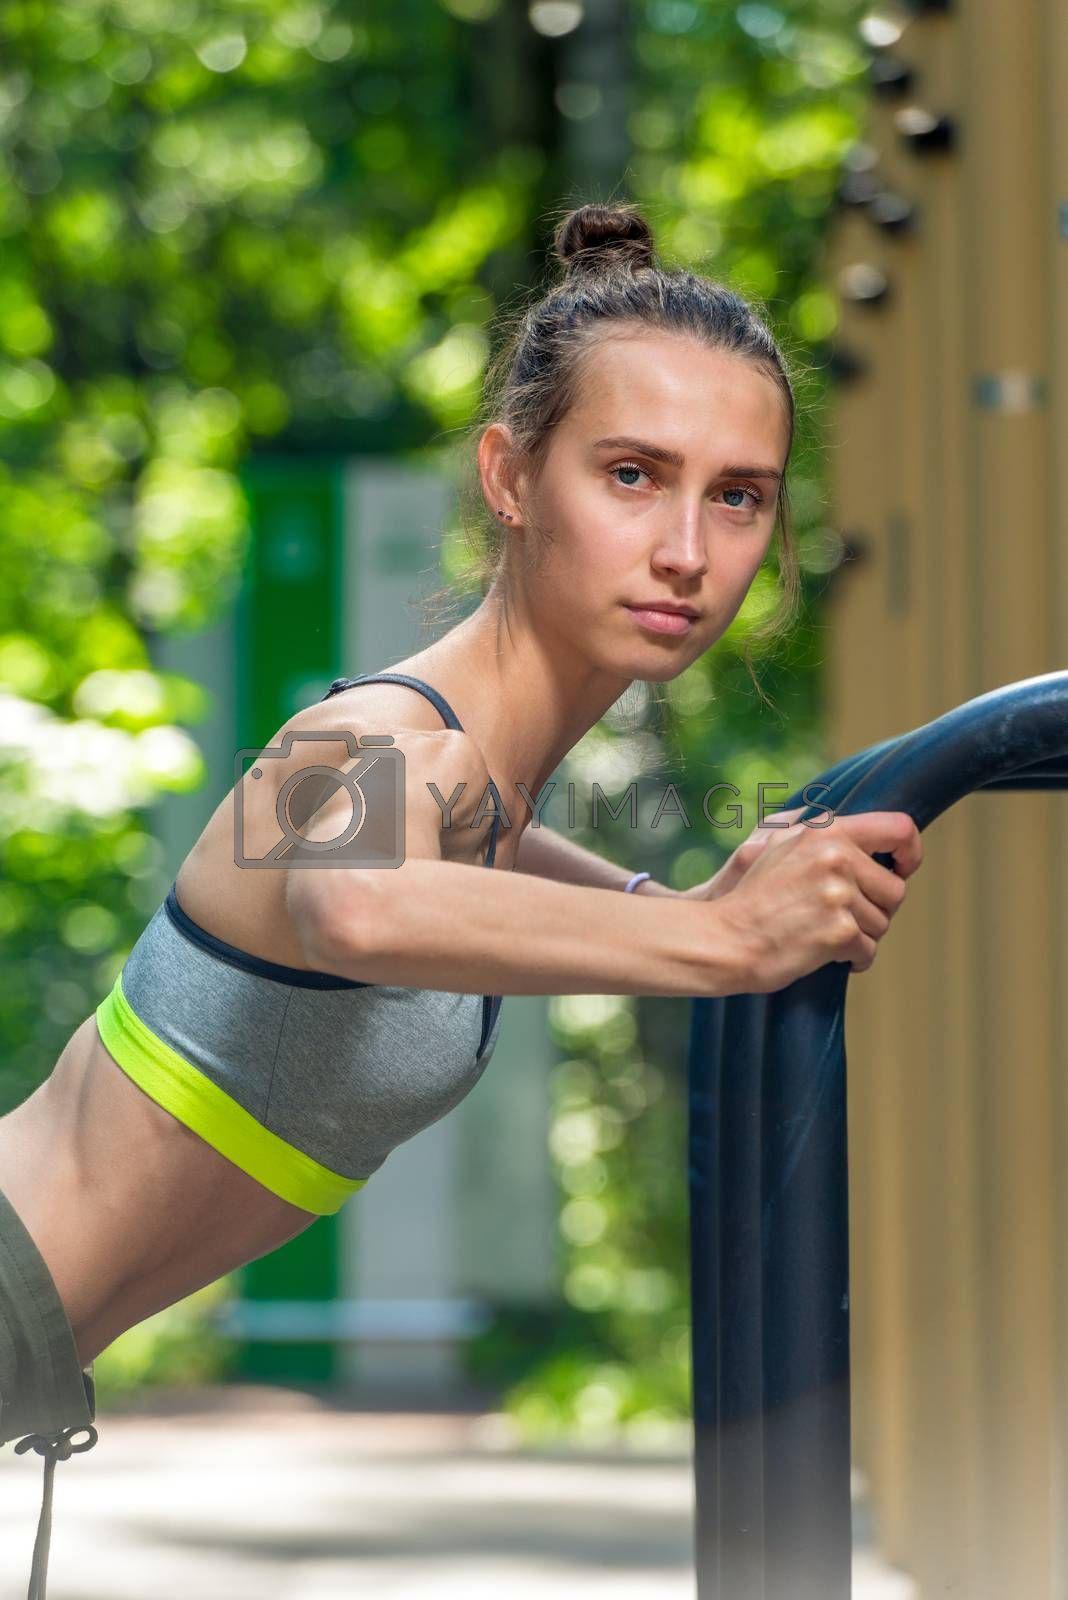 closeup portrait of a female athlete with a sports figure exerci by Labunskiy K.